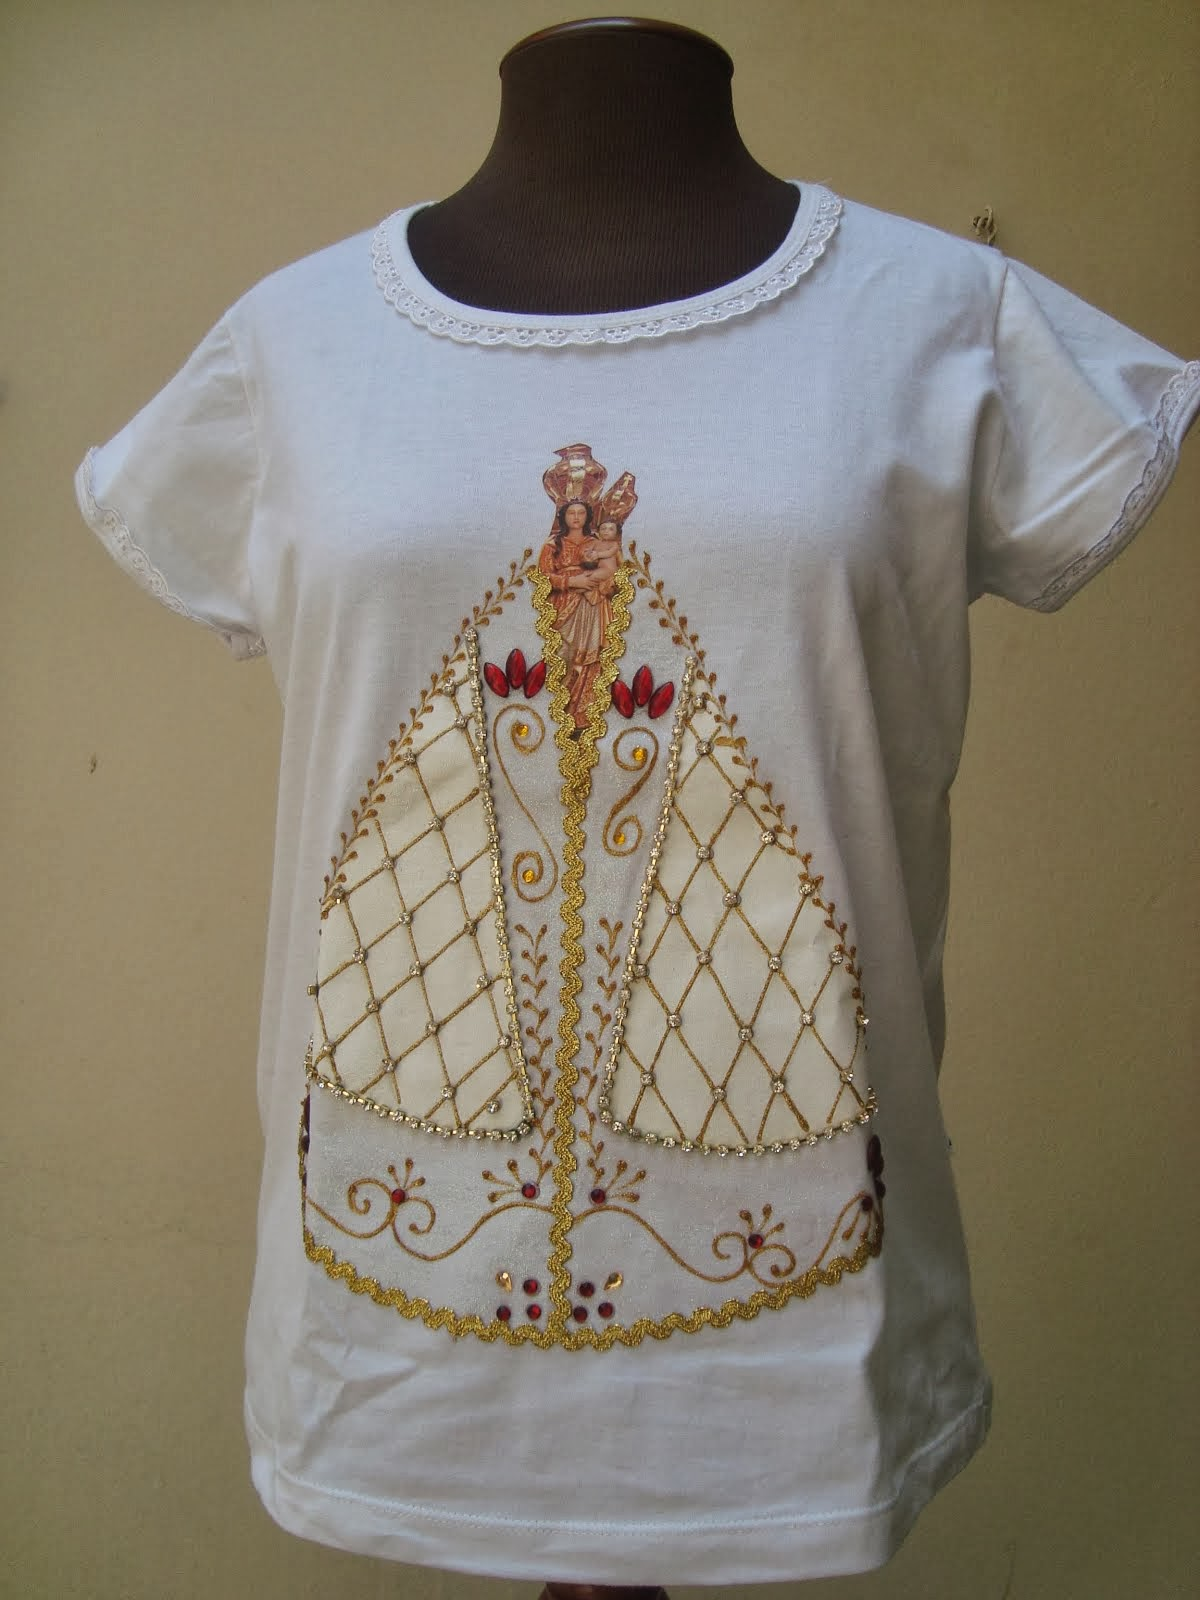 Camiseta Cateo - Círio de Nazaré